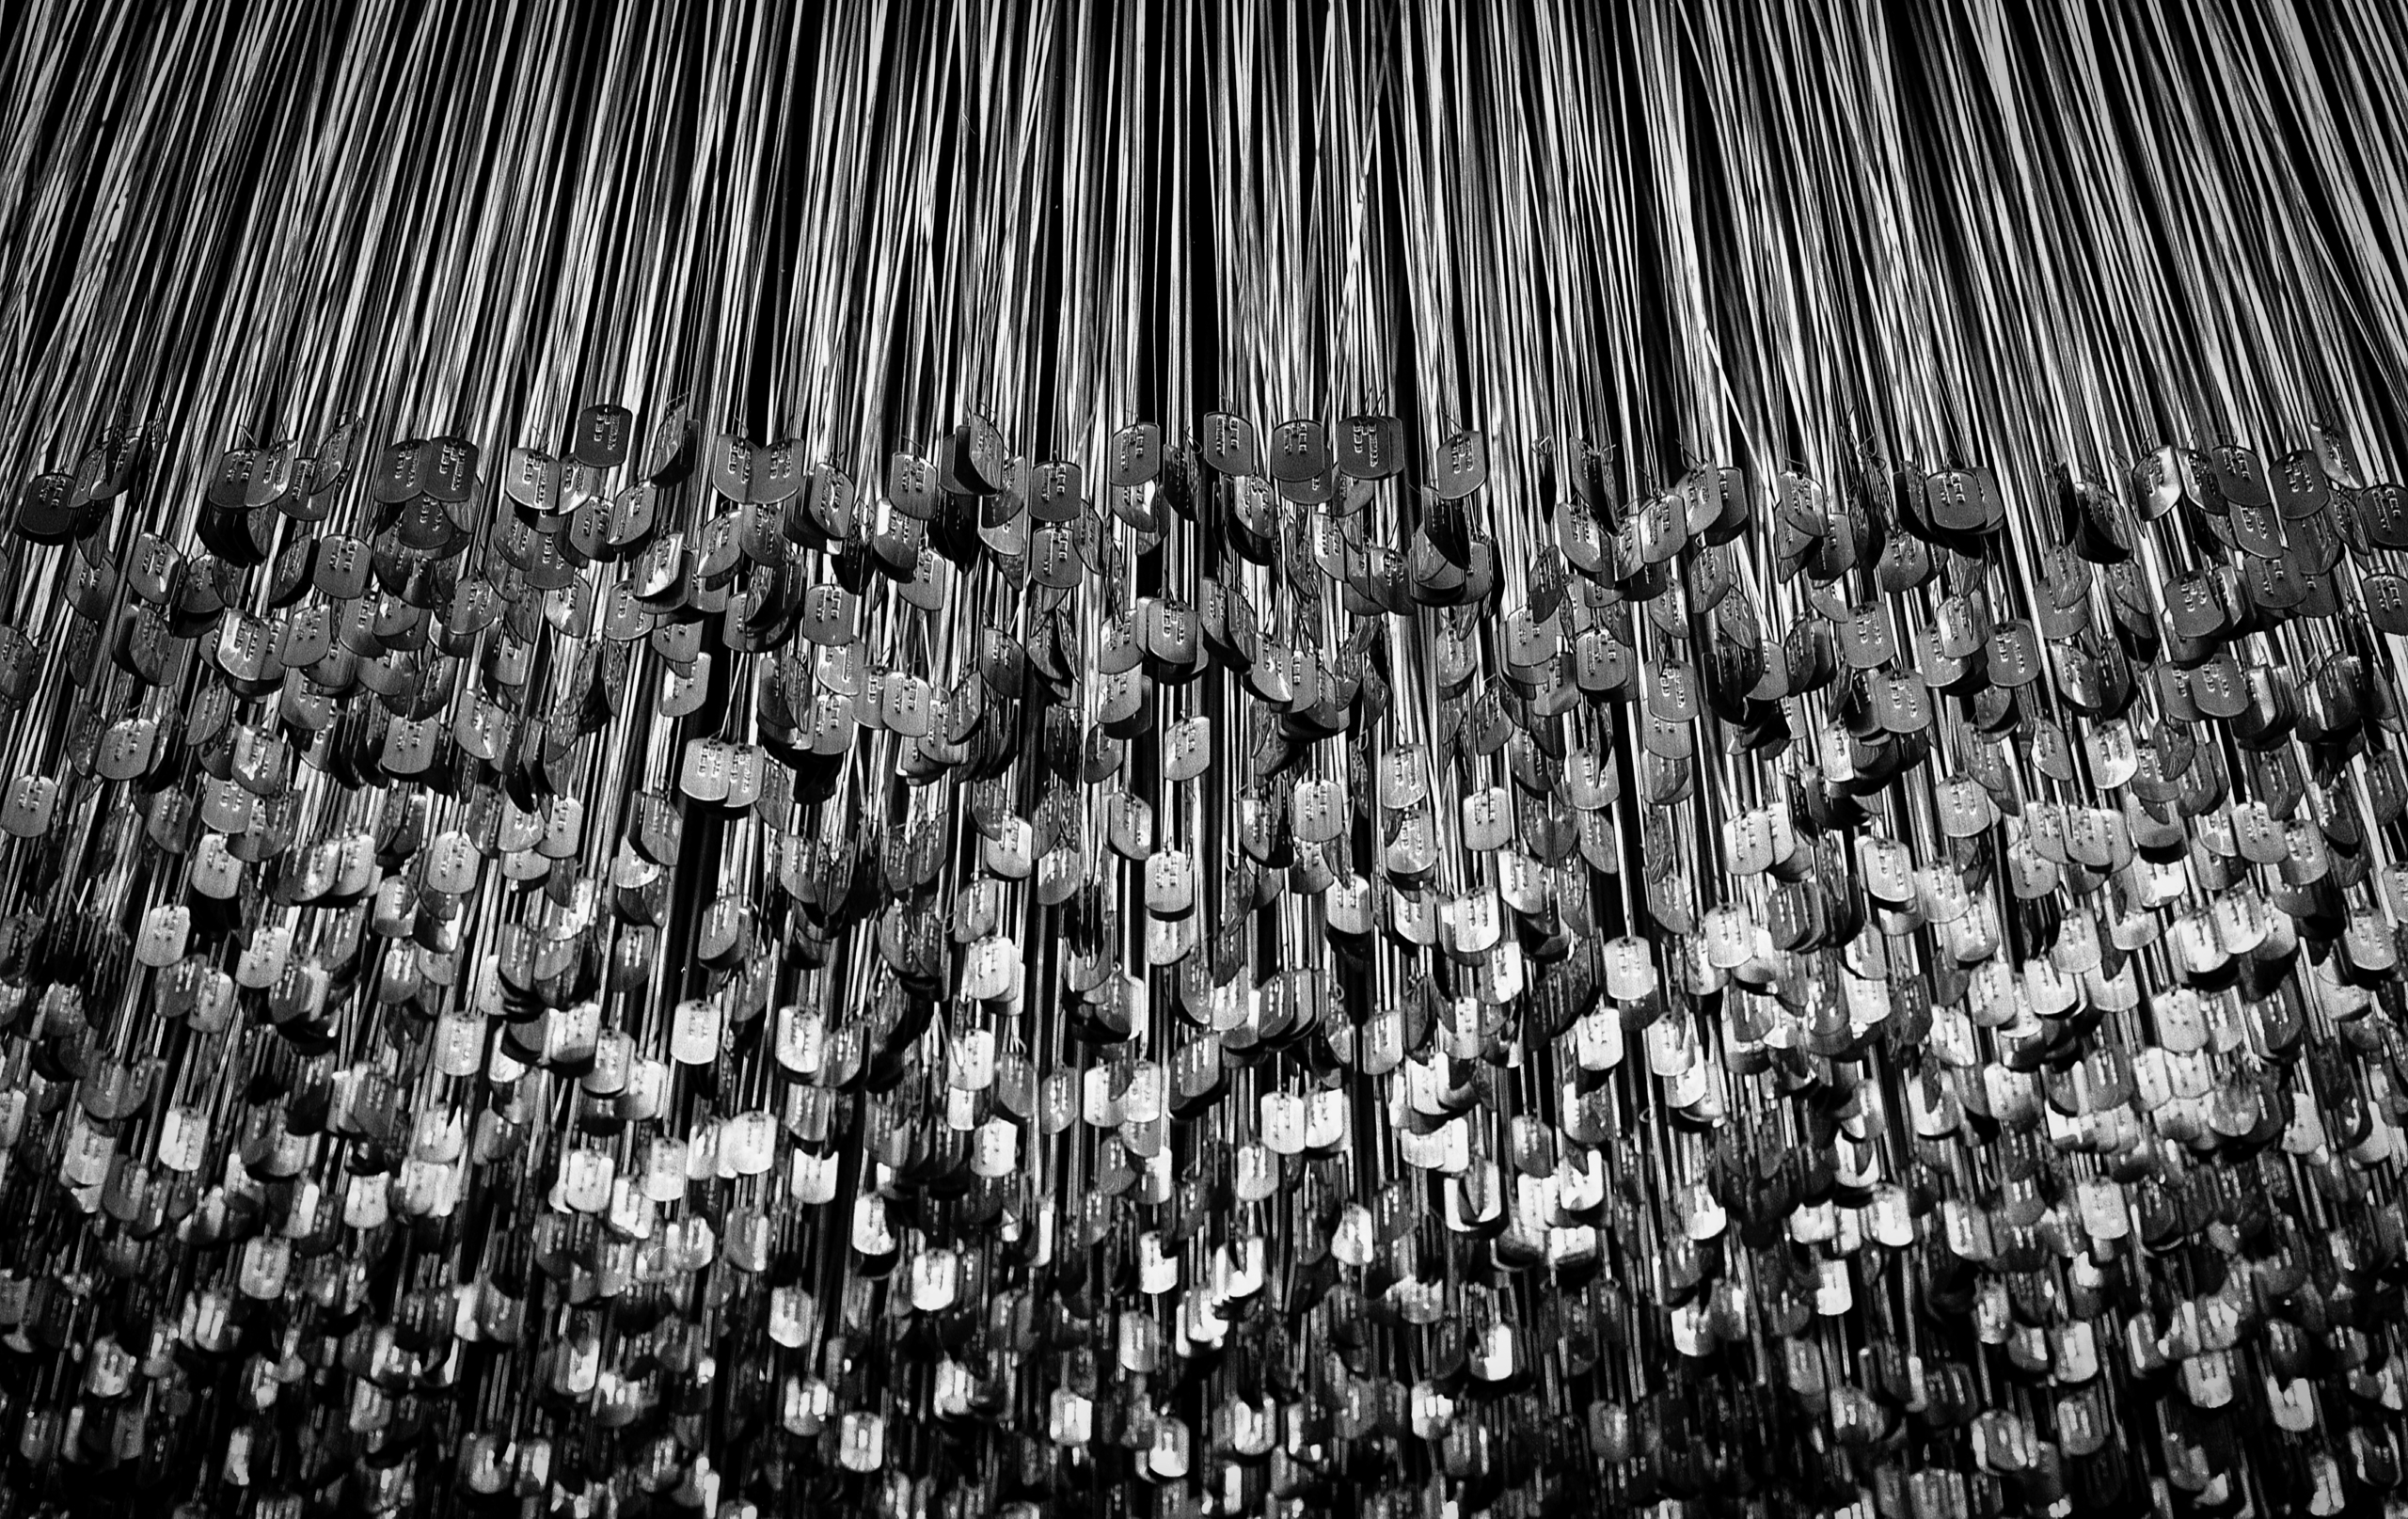 58,000 dog tags, representing p - junwin | ello